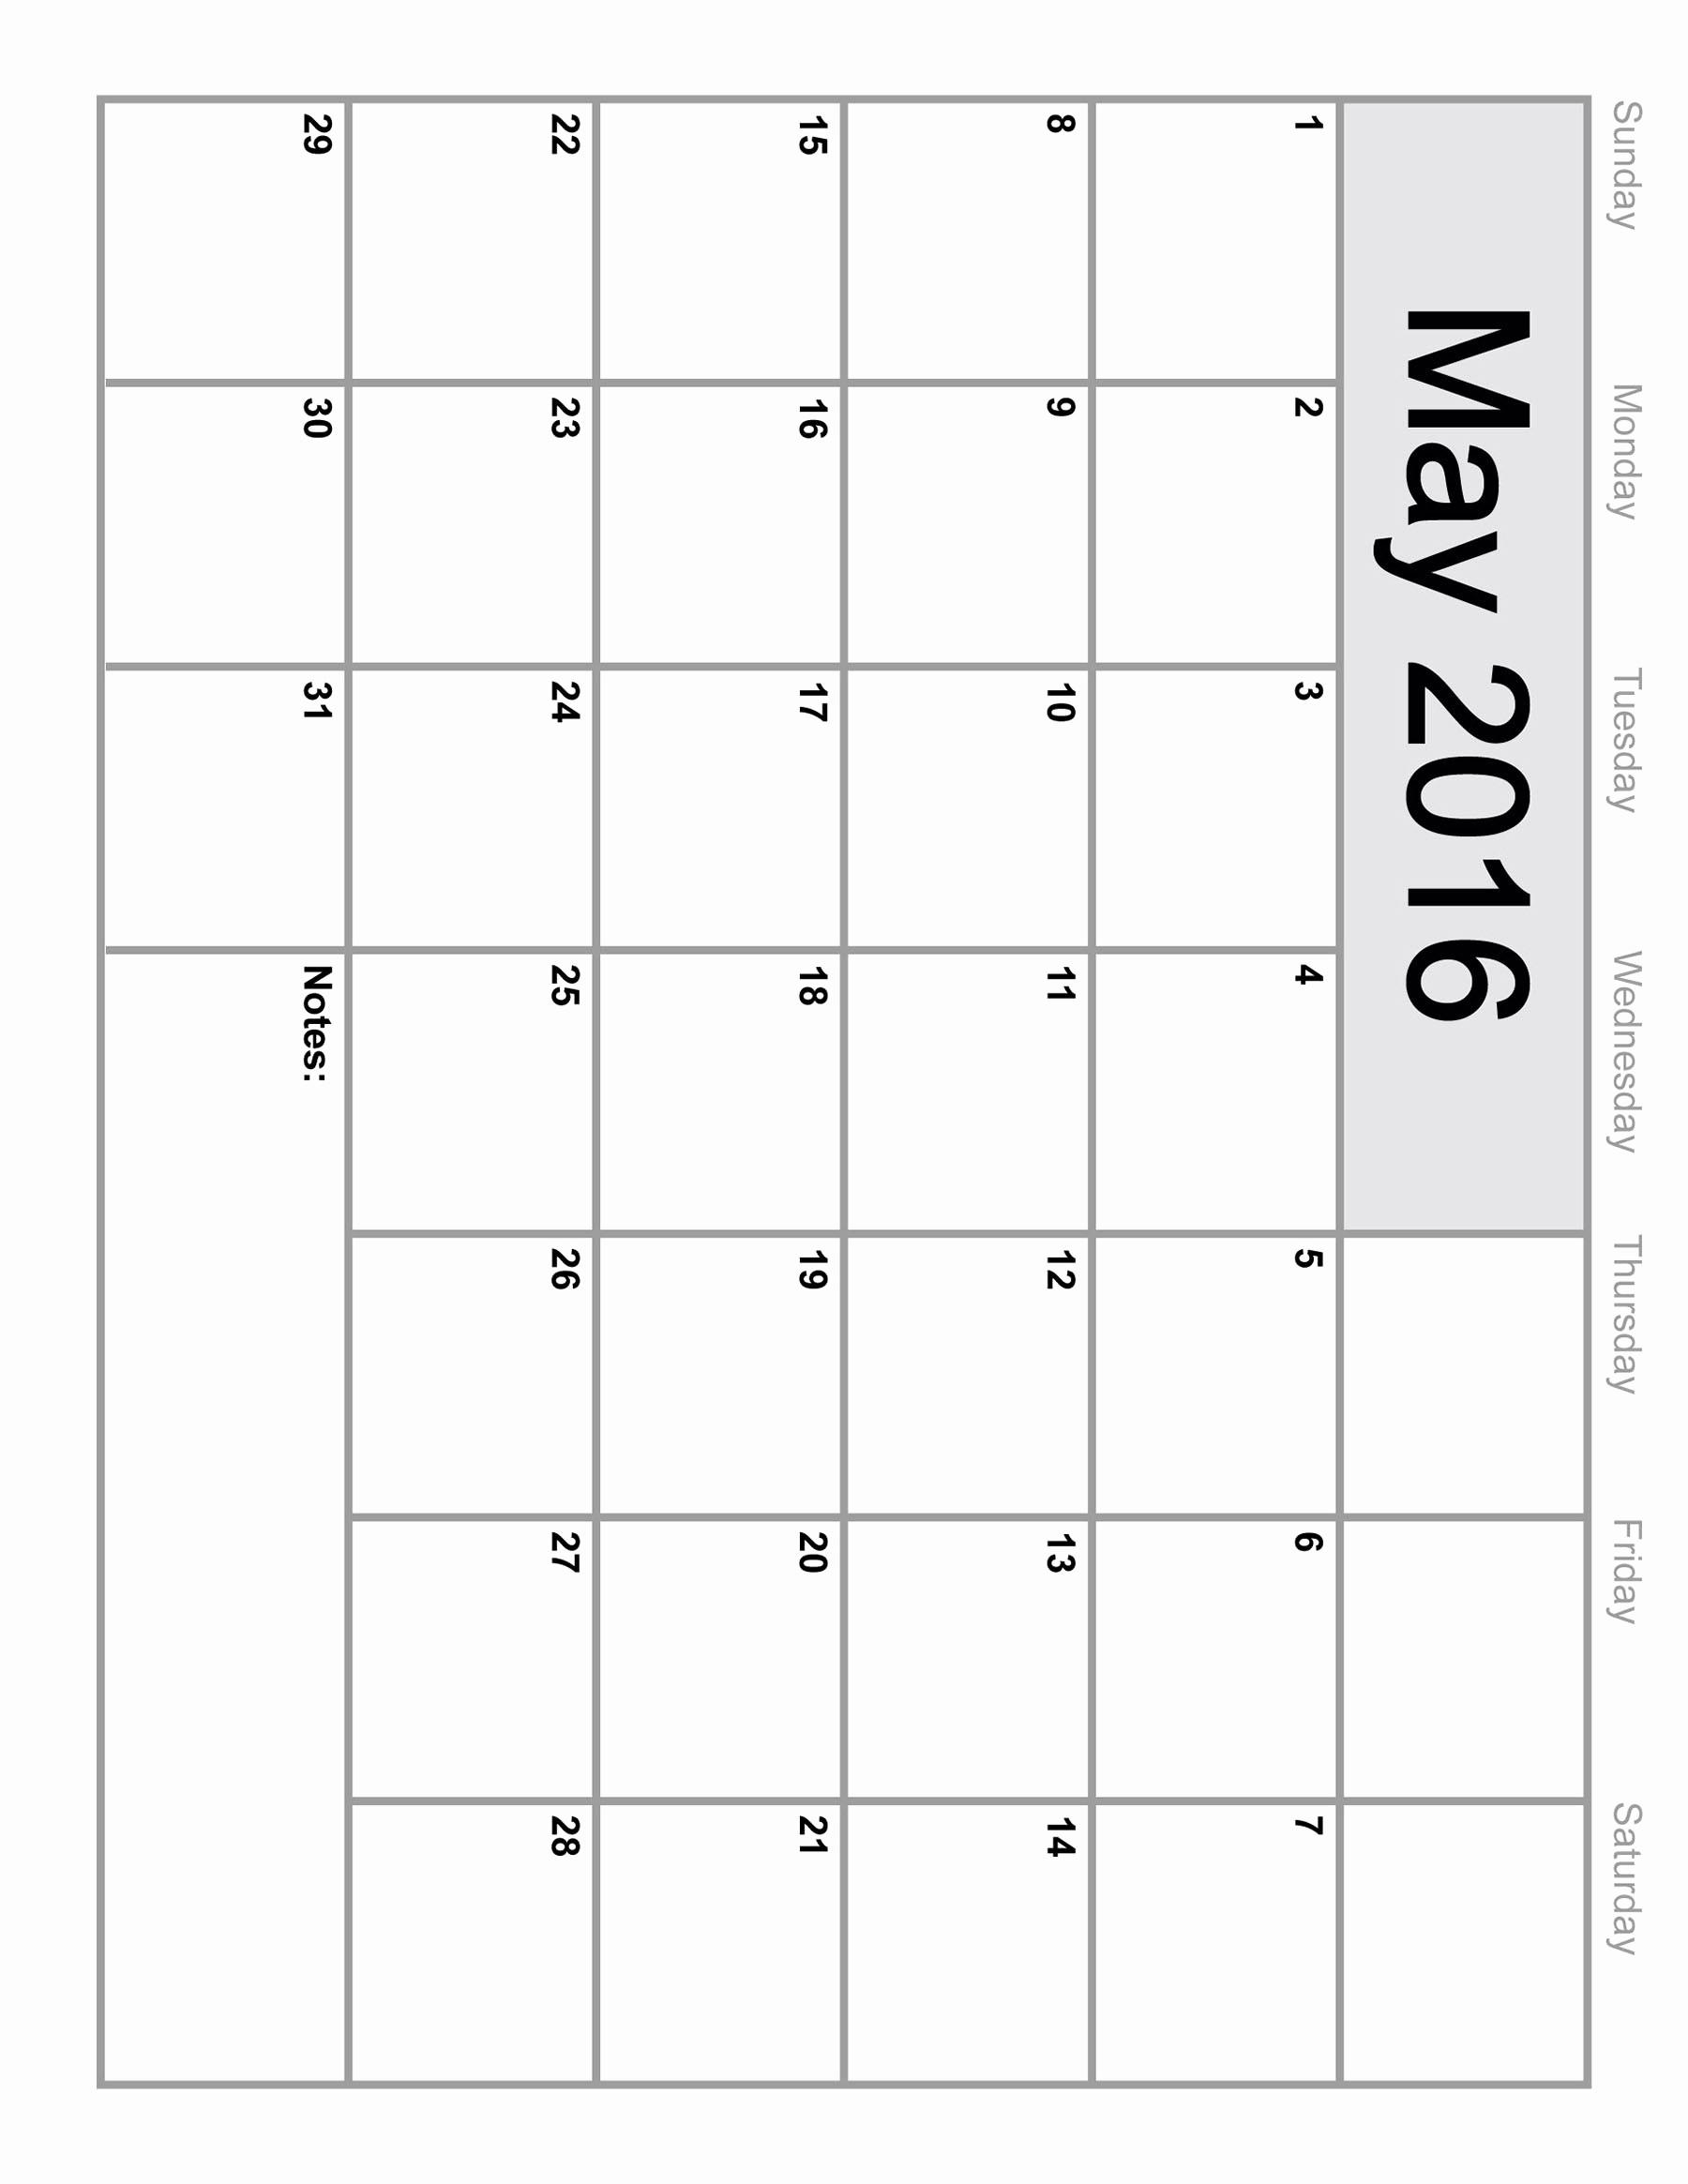 3 Month Calendar 2016 Template Beautiful 3 Month June July August Calendar 2016 Printable